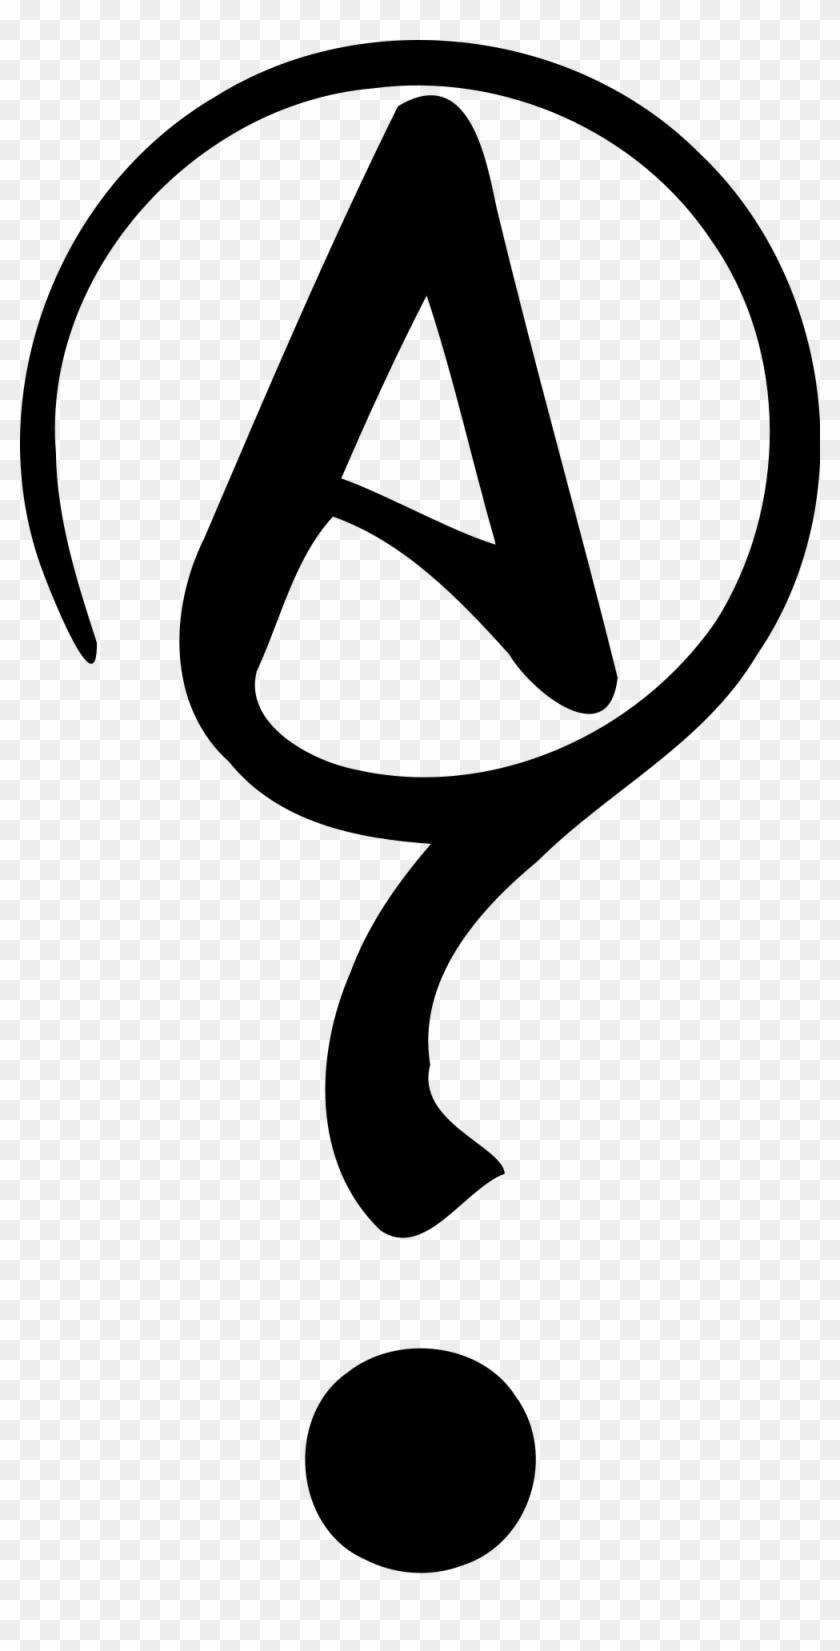 Agnostic Question Mark - Agnostic Question Mark #115898